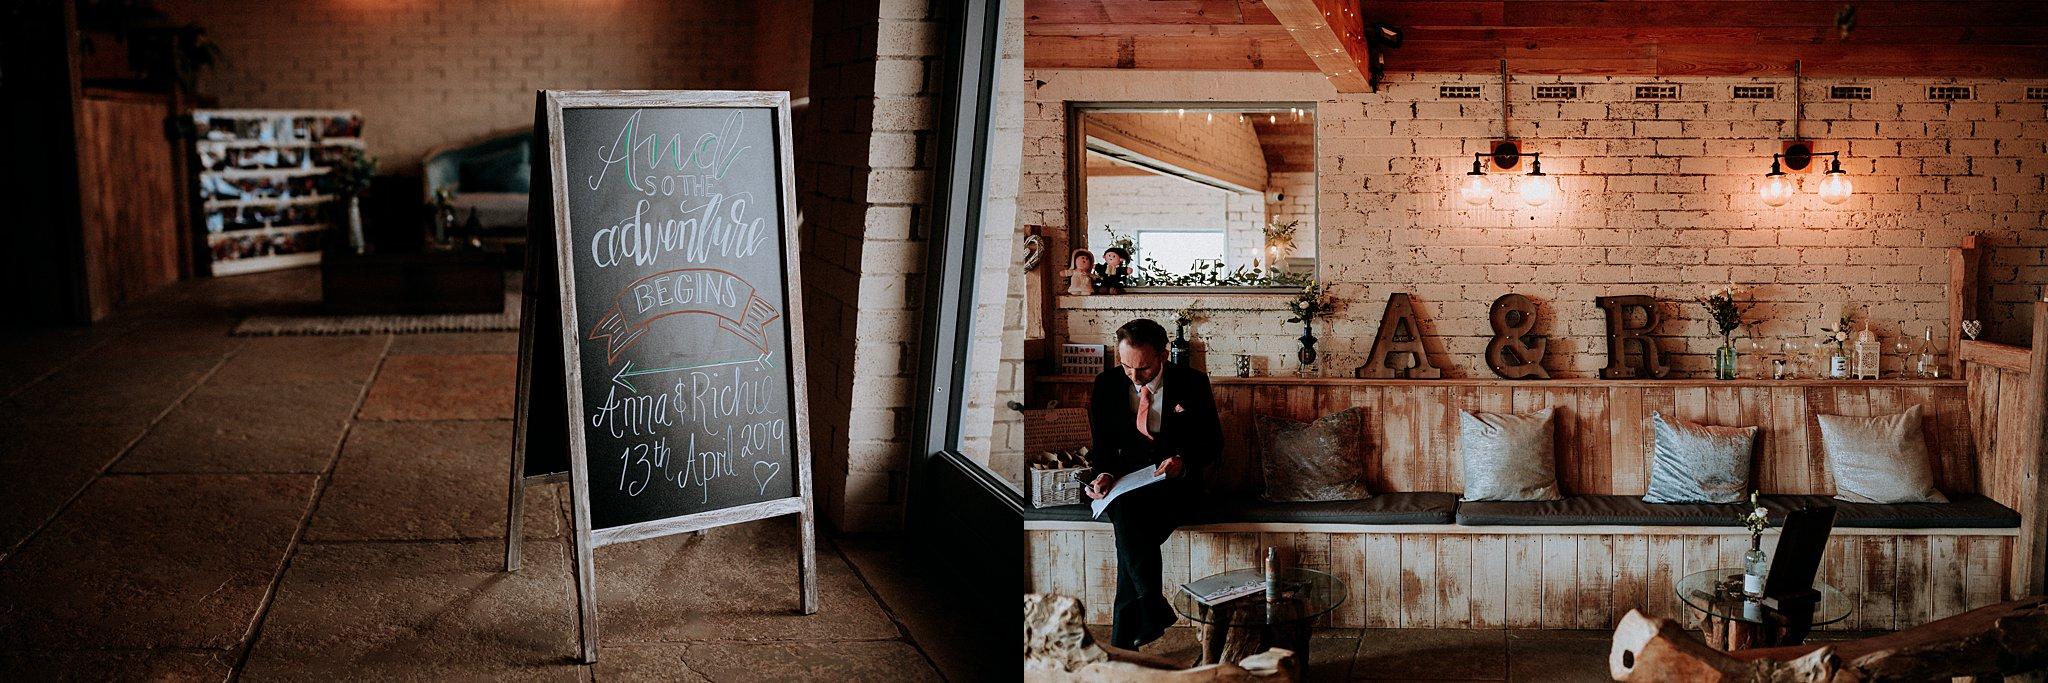 barn wedding inspo